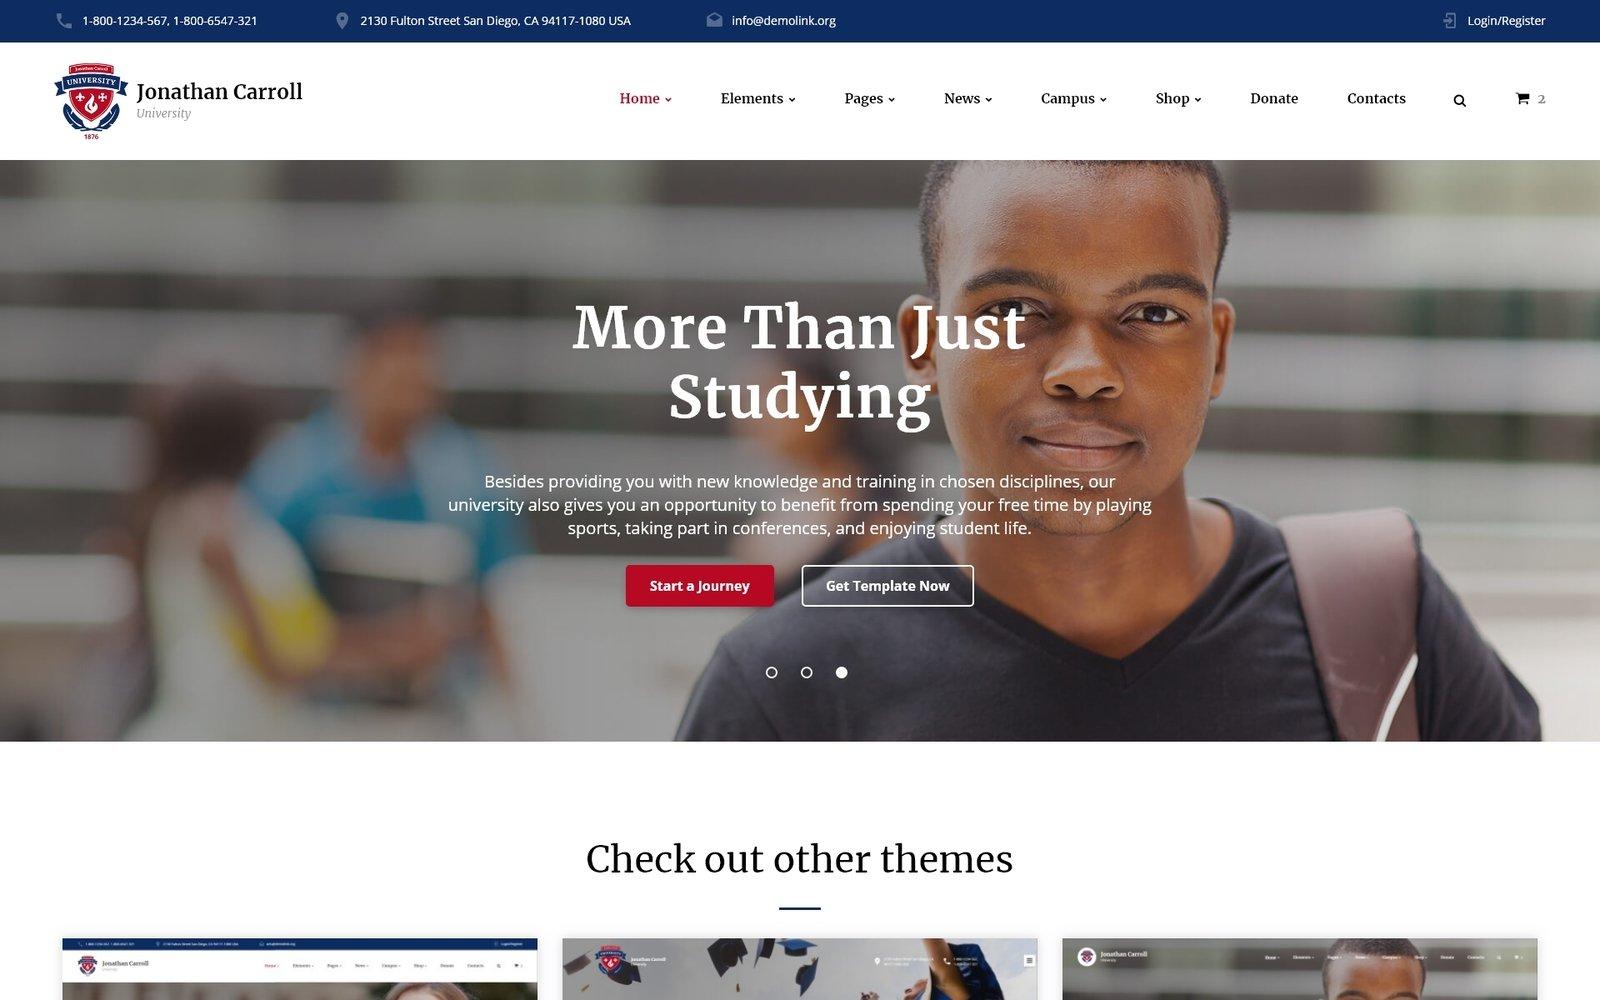 """University Responsive Website Template"" 响应式网页模板 #59029"